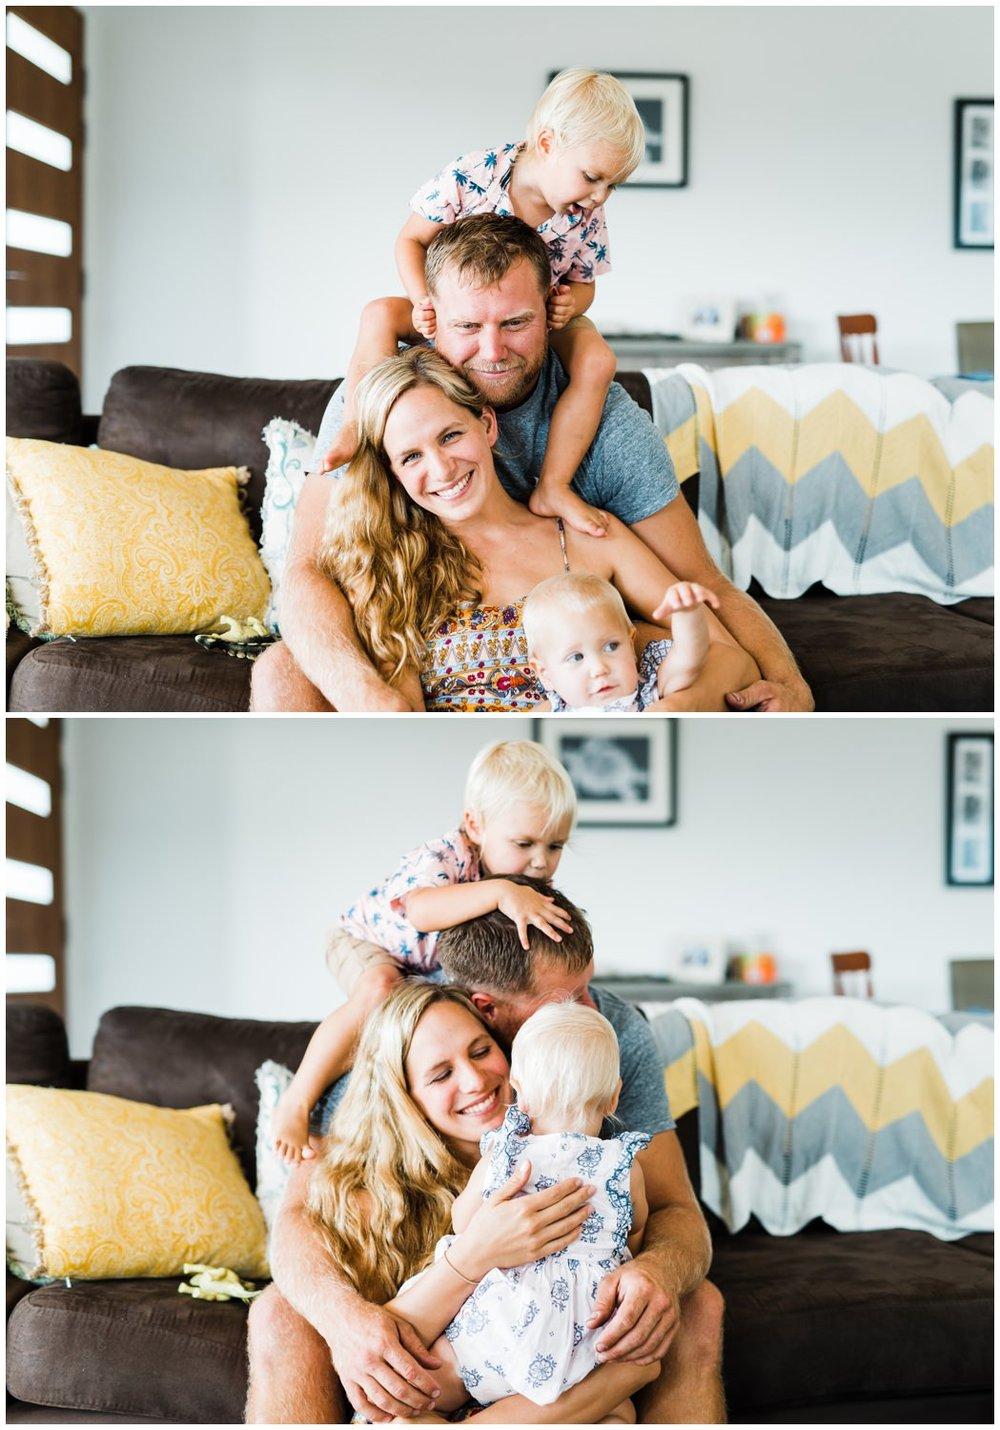 sunshine-coast-family-lifestyle-photography-at-home12.jpg